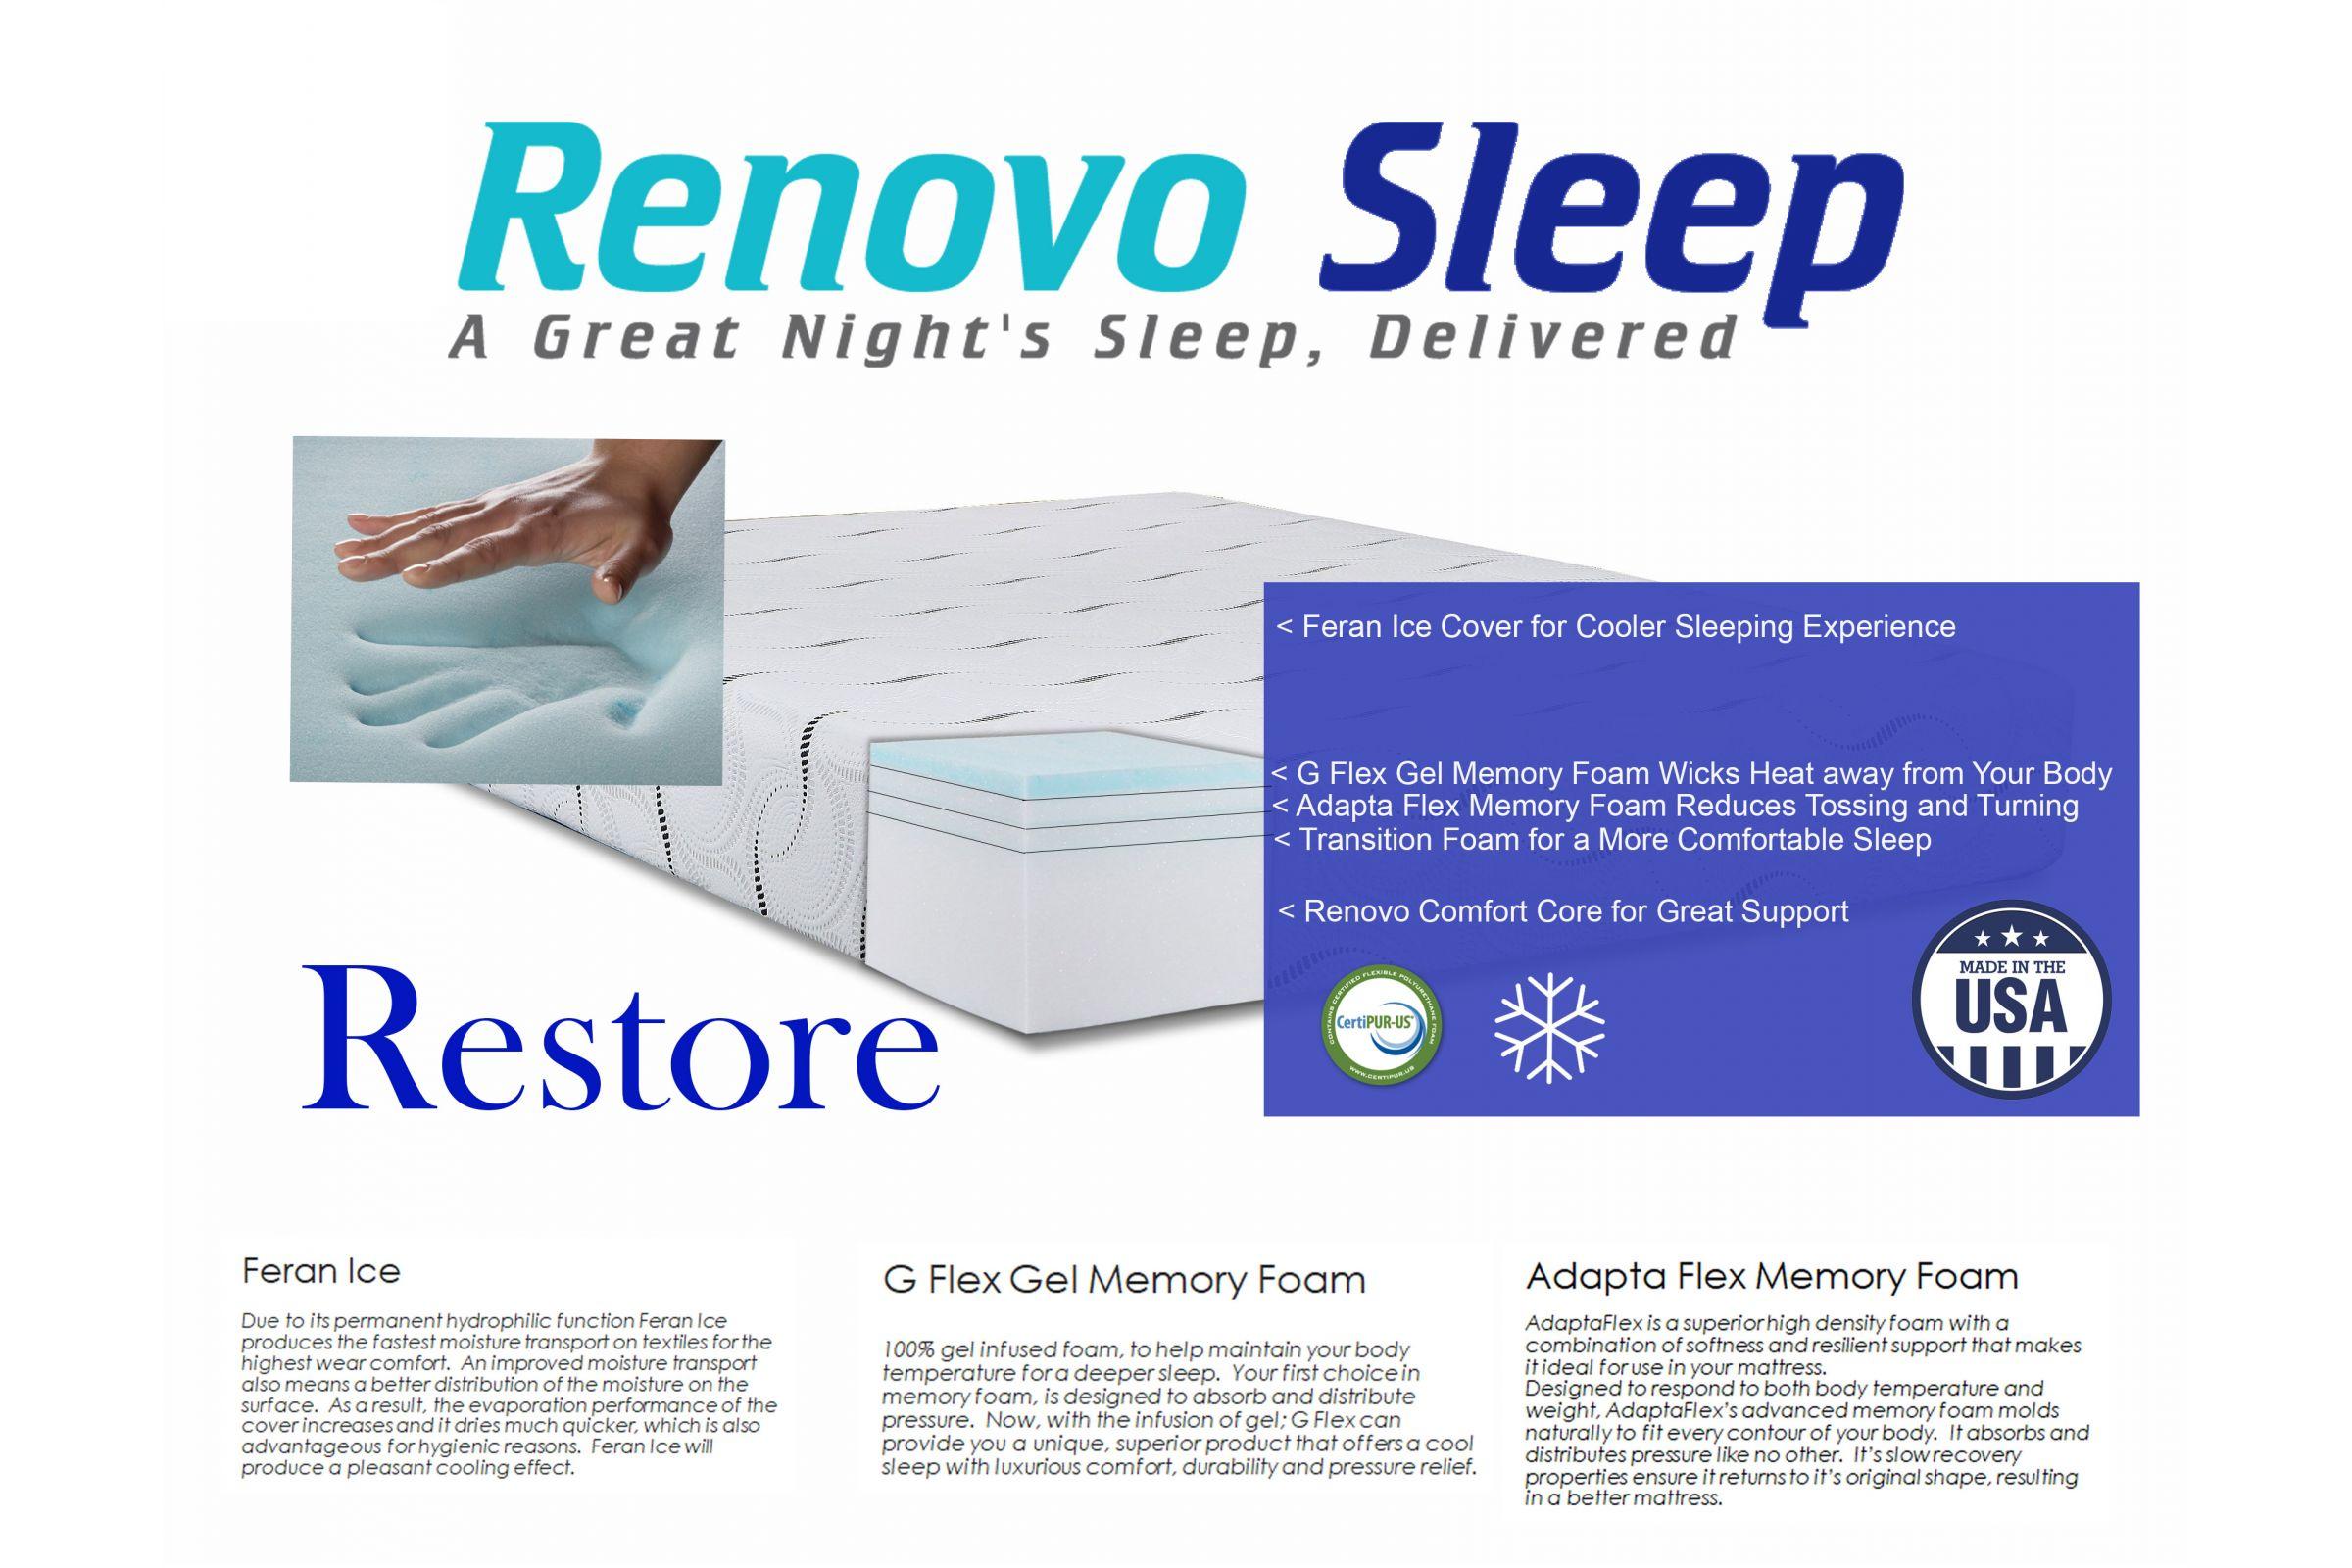 Restore by Renovo Sleep Mattresses Collection